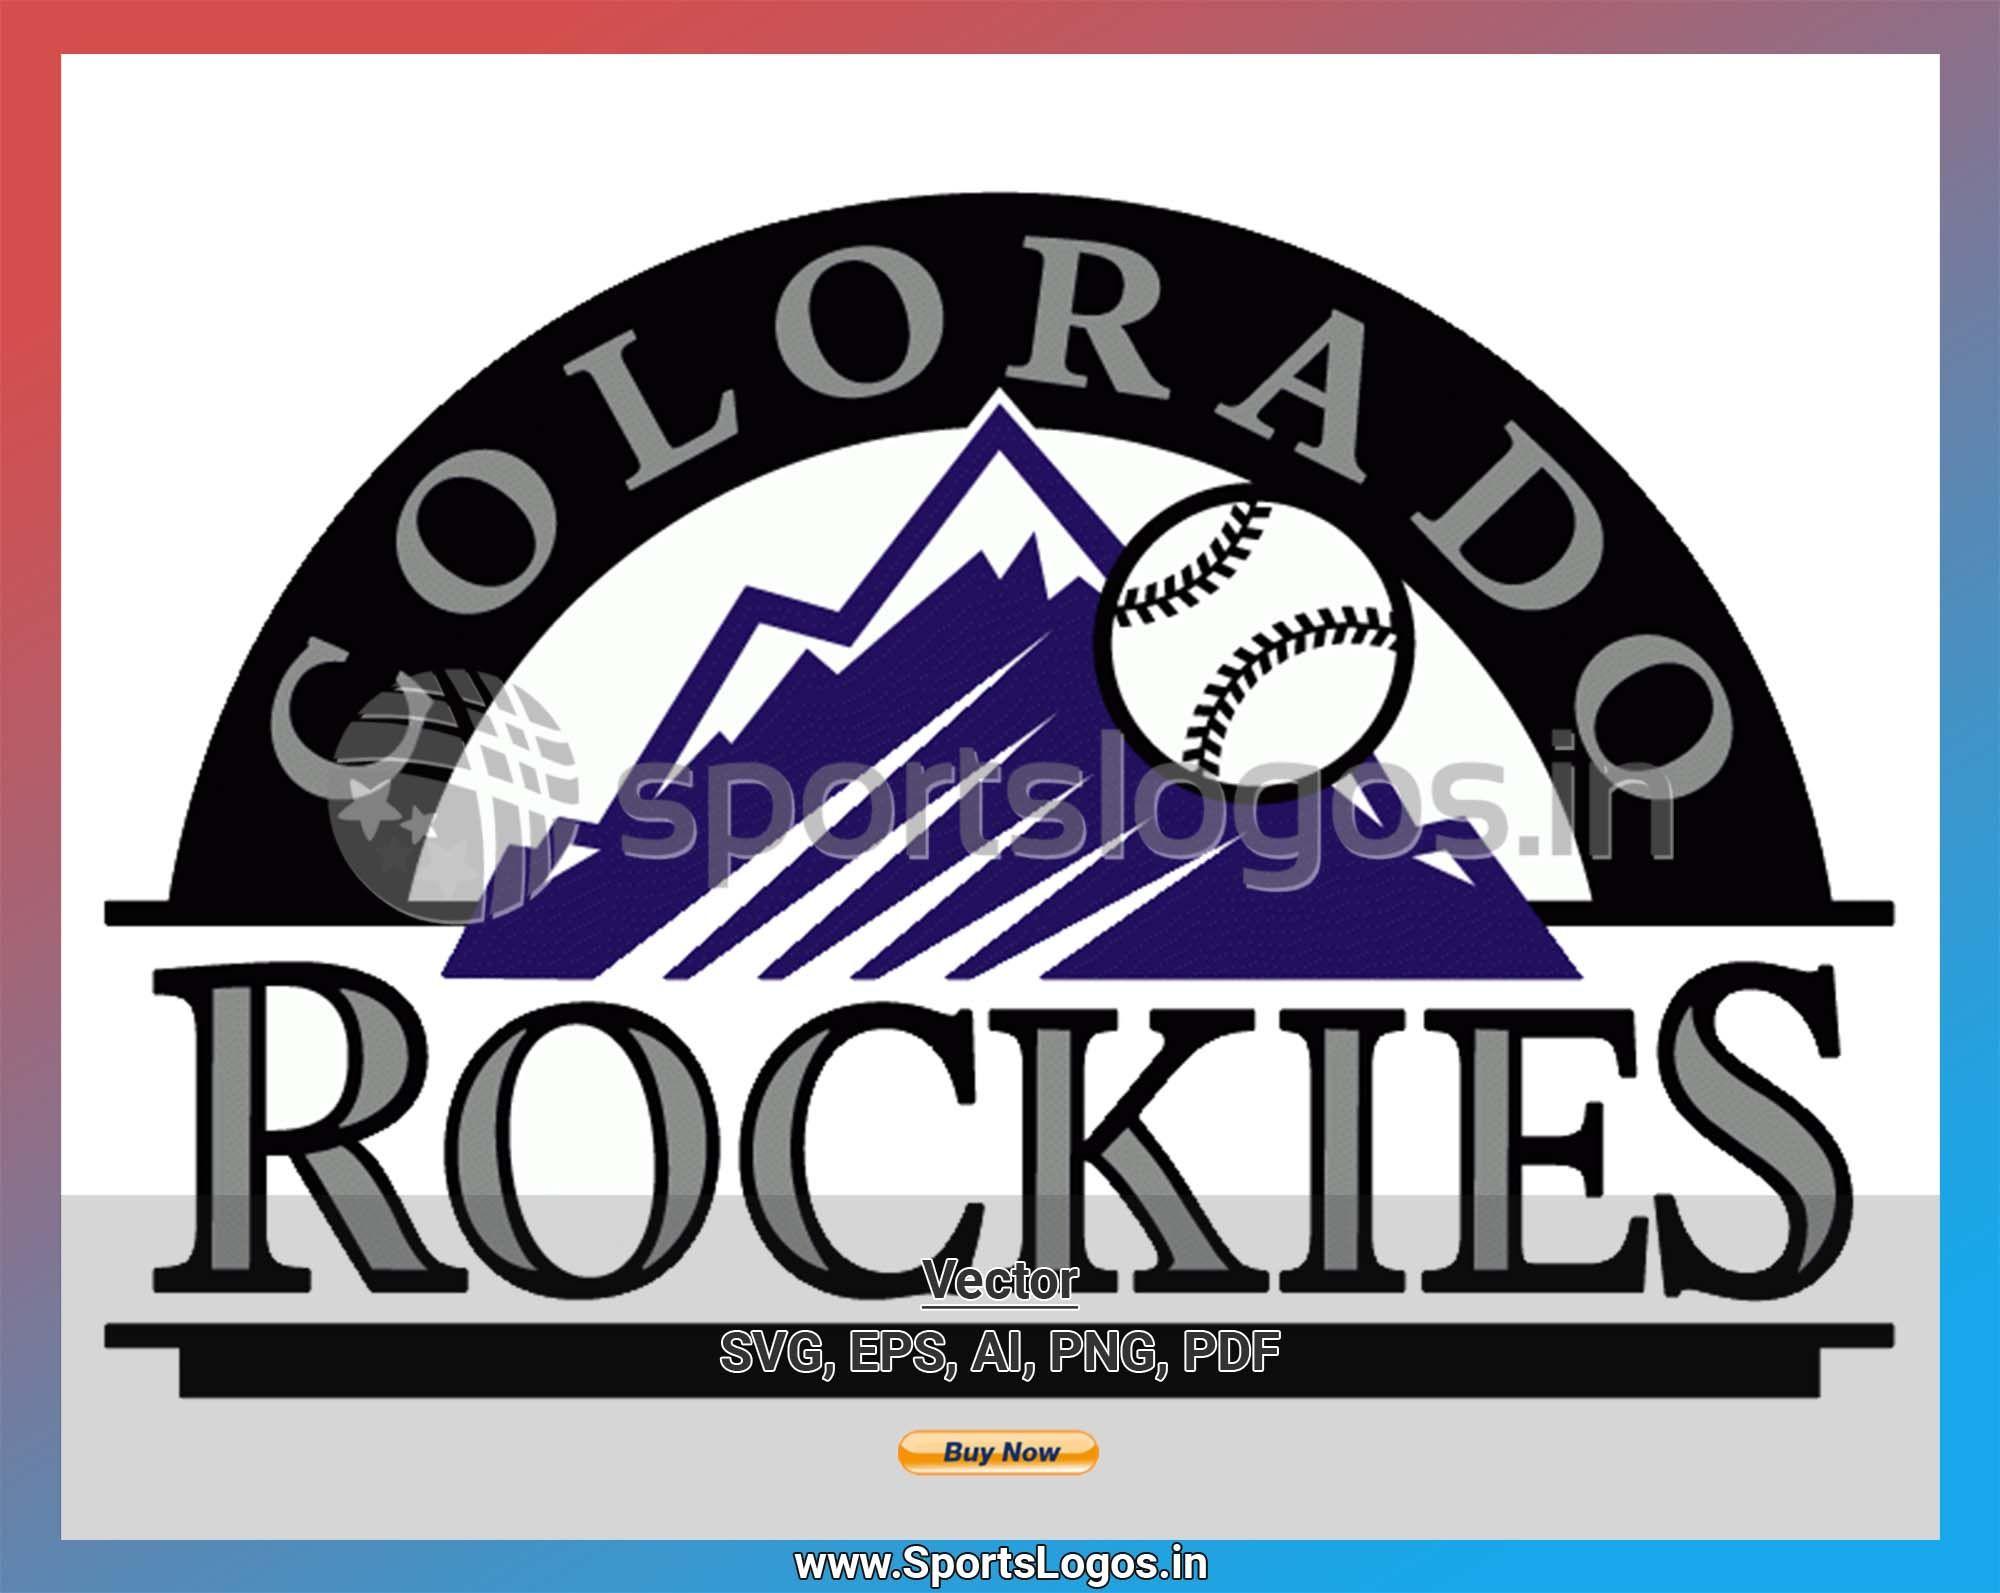 Colorado Rockies Baseball Sports Vector Svg Logo In 5 Formats Spln000985 Sports Logos Embroidery Vector For Nfl Nba Nhl Mlb Milb And More Colorado Rockies Baseball Colorado Rockies Rockies Baseball